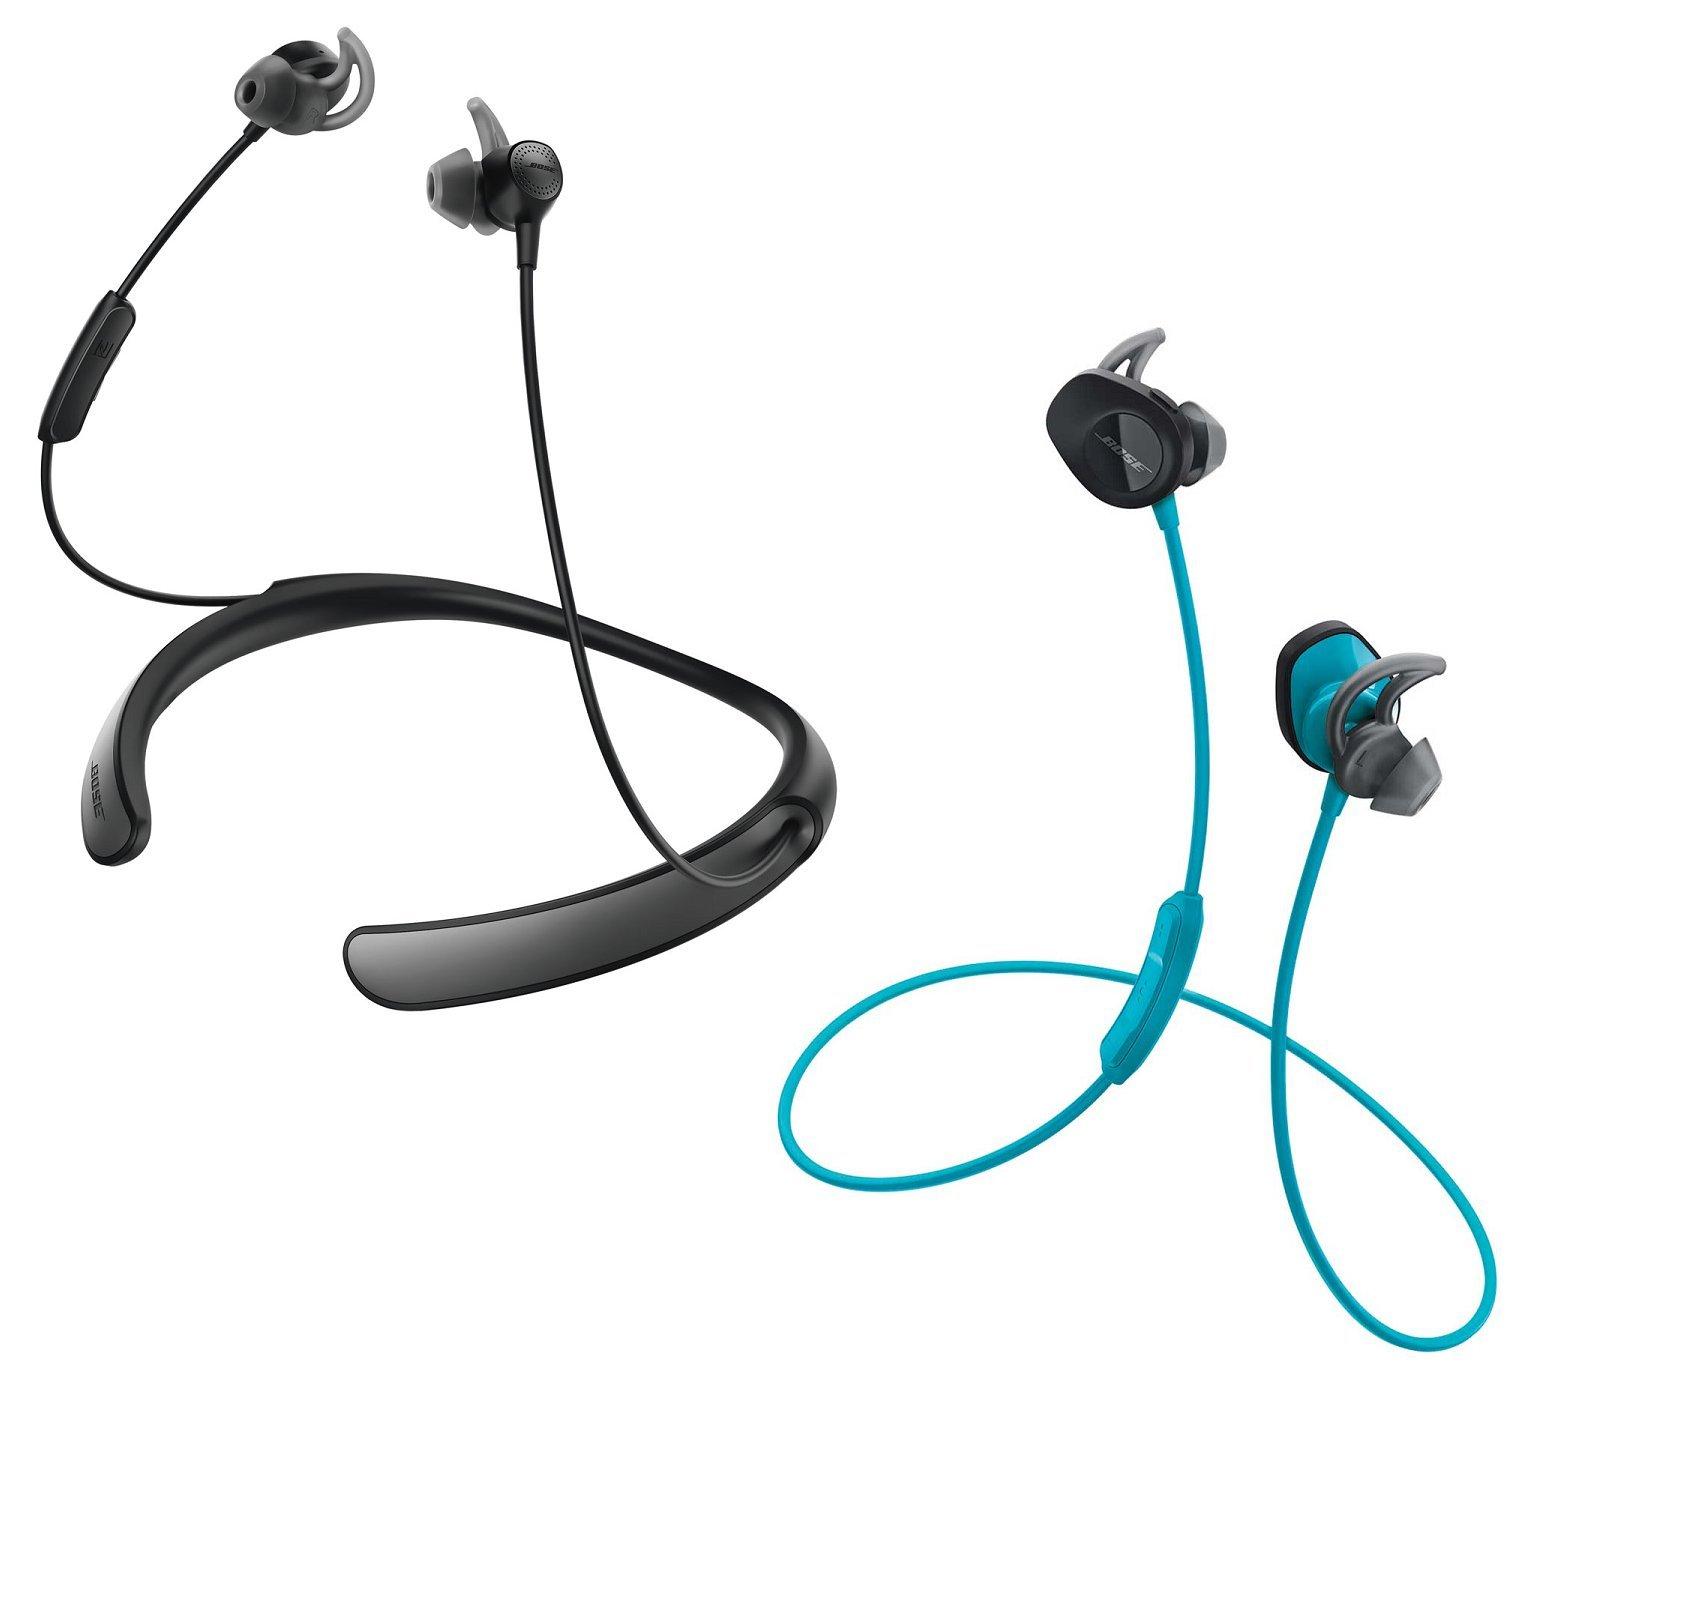 Bose Bluetooth Headphone Bundle - SoundSport Wireless Aqua & QuietControl 30 Black In-ear Headphones